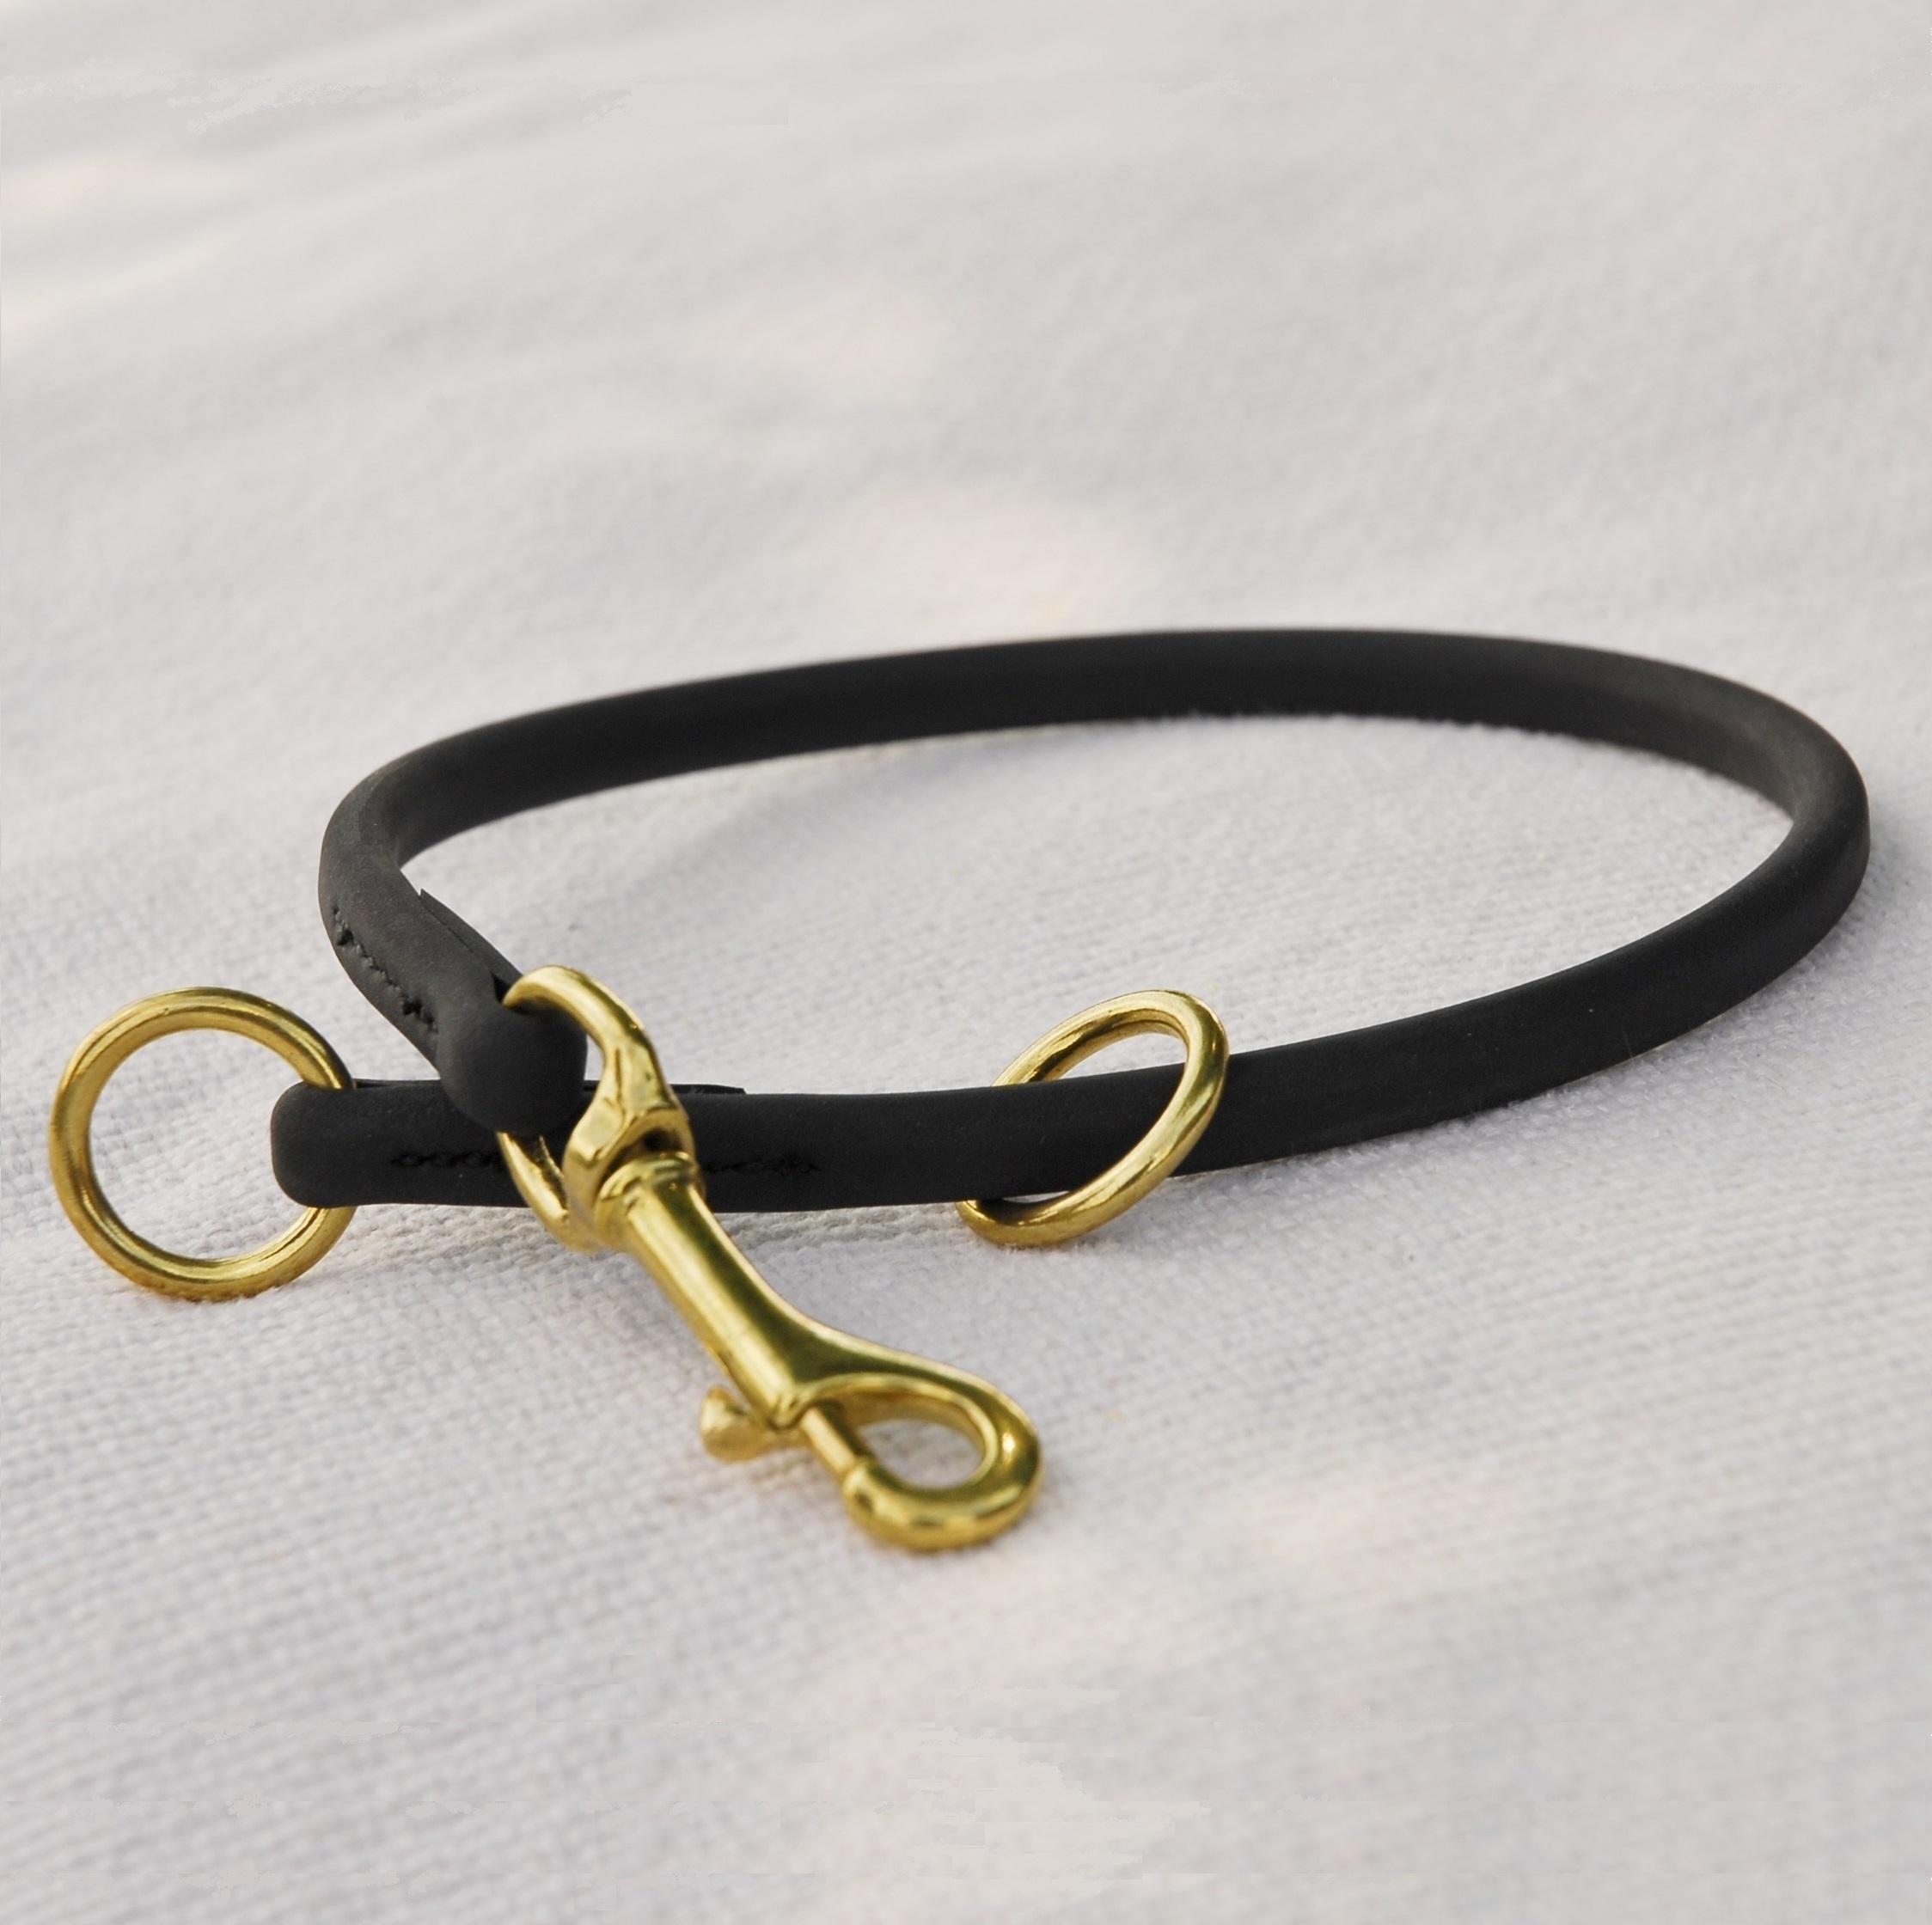 dog collar, biothane collar, dominant dog collars, biothane dog collars, dog leash, protection training leash, mississauga, ontario, oakville, brampton, biothane